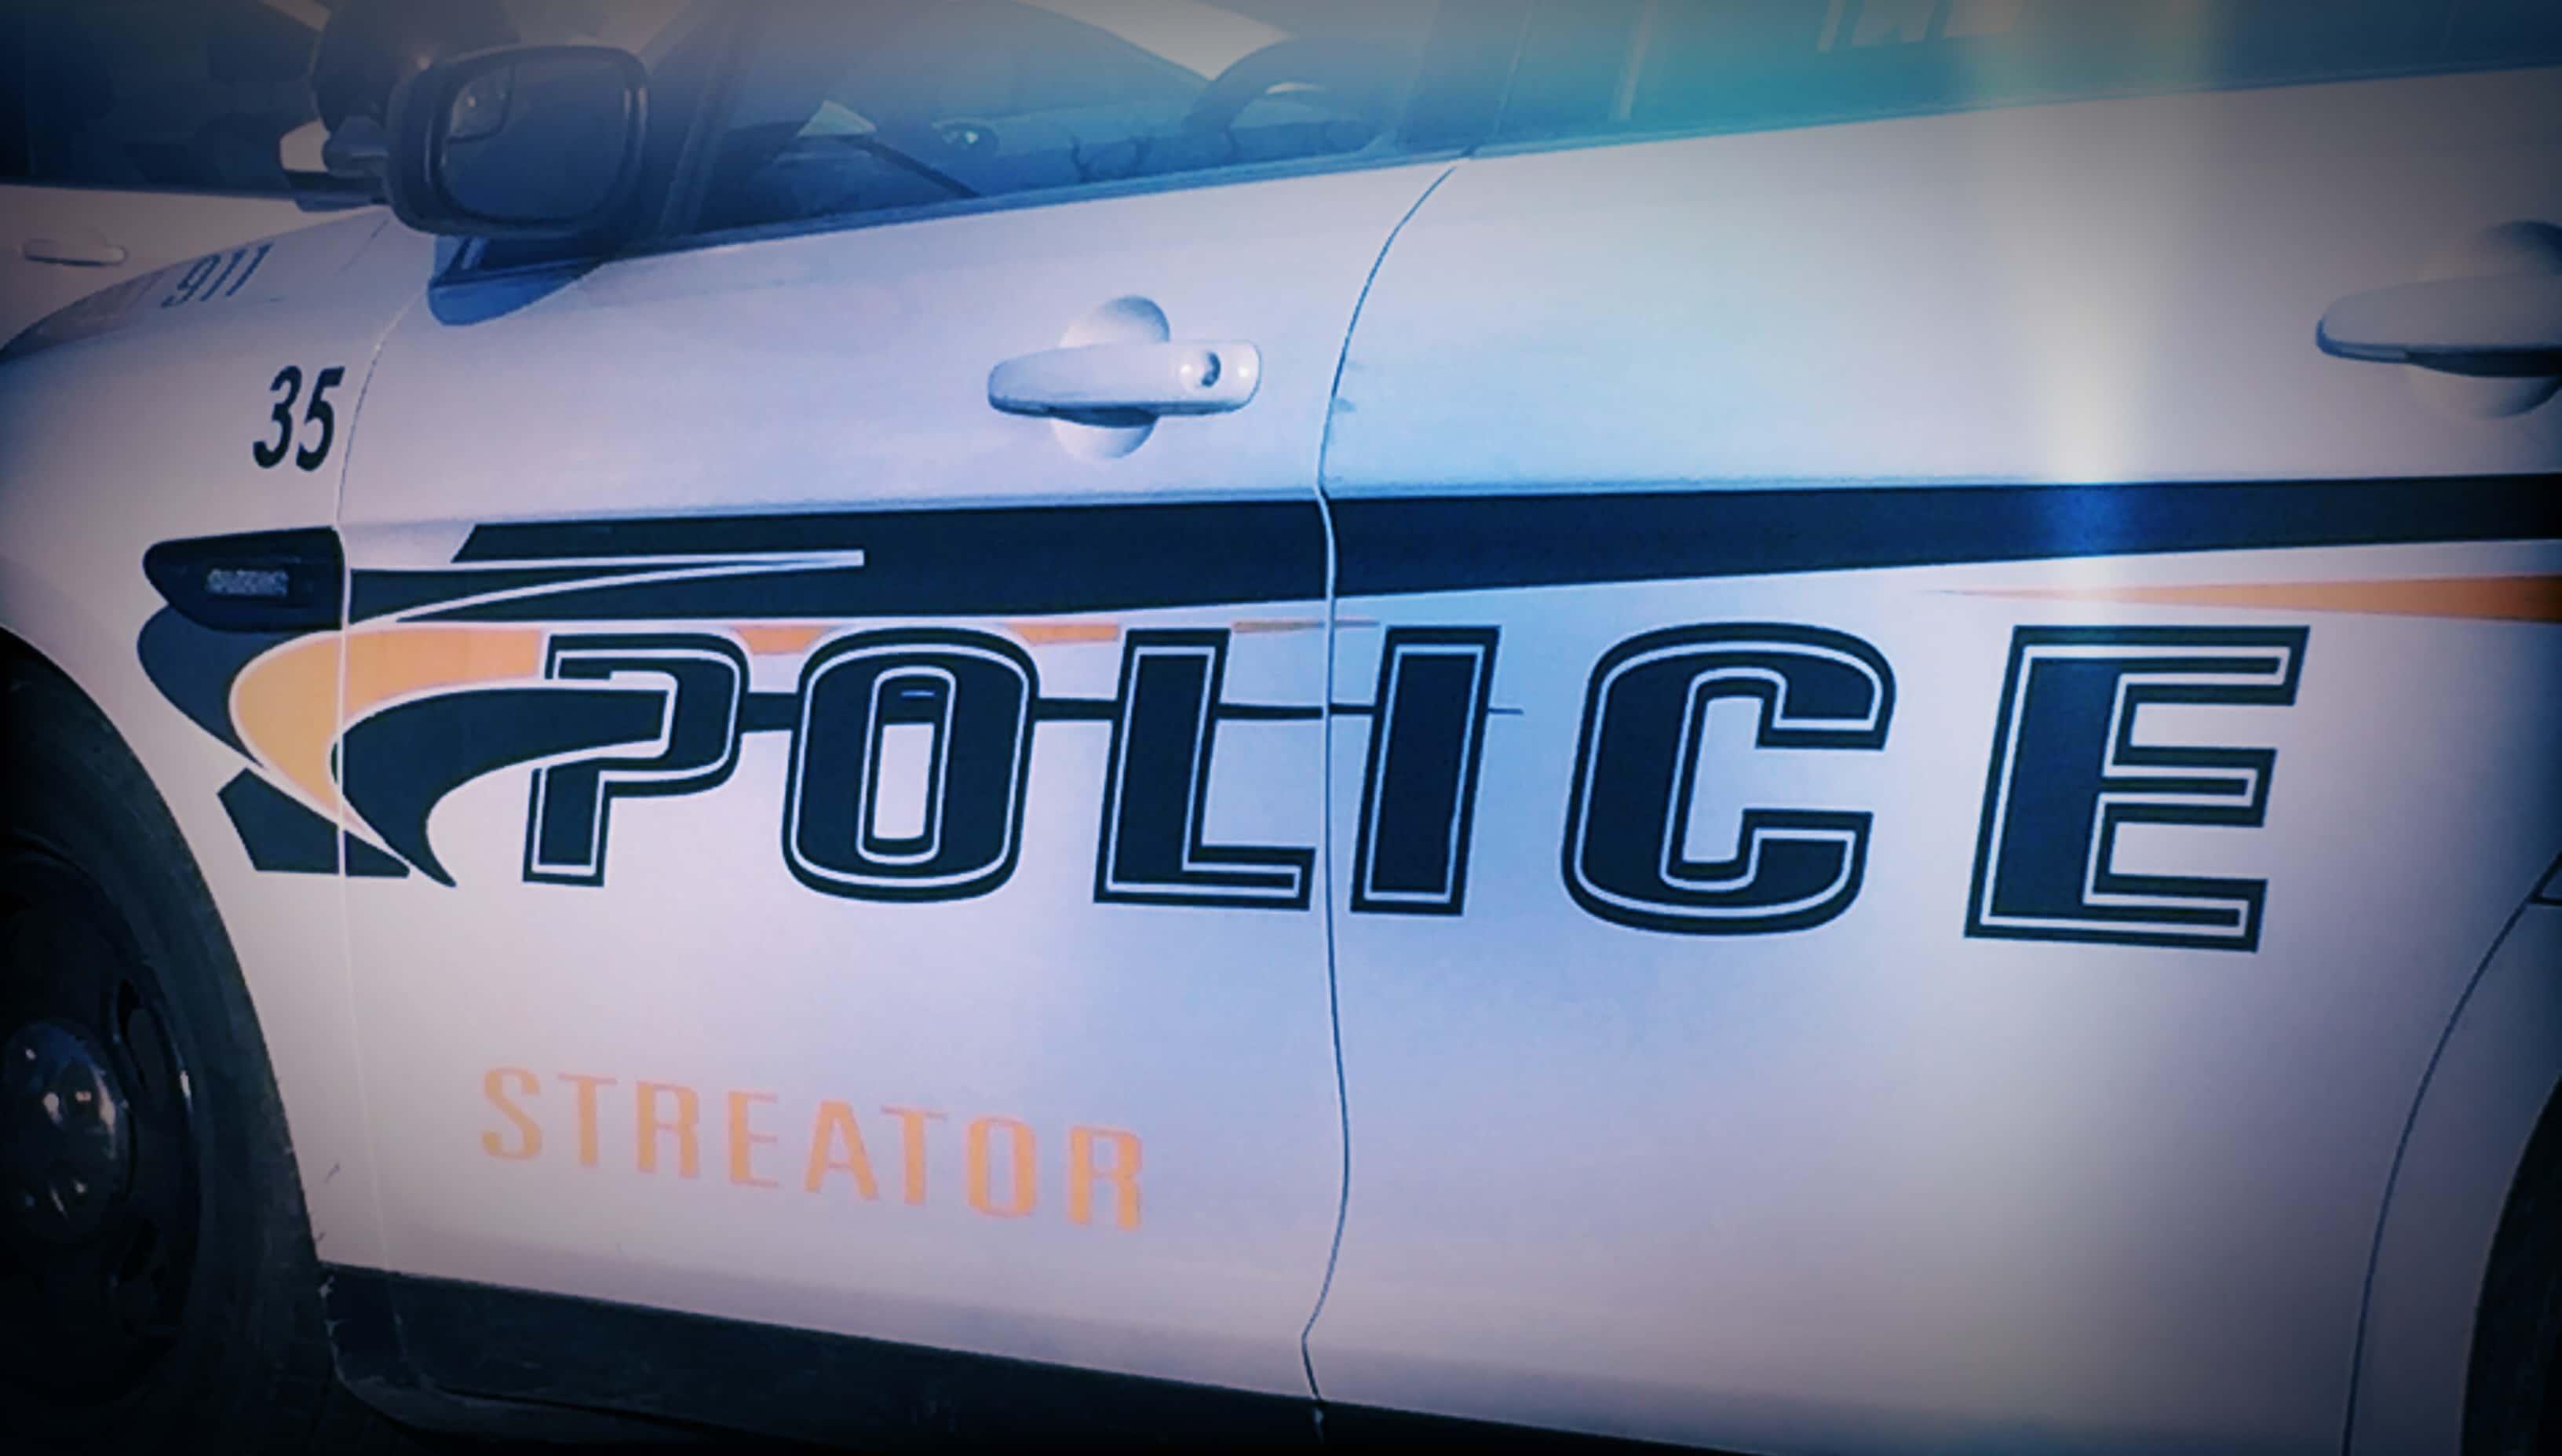 Streator Illinois Police Department